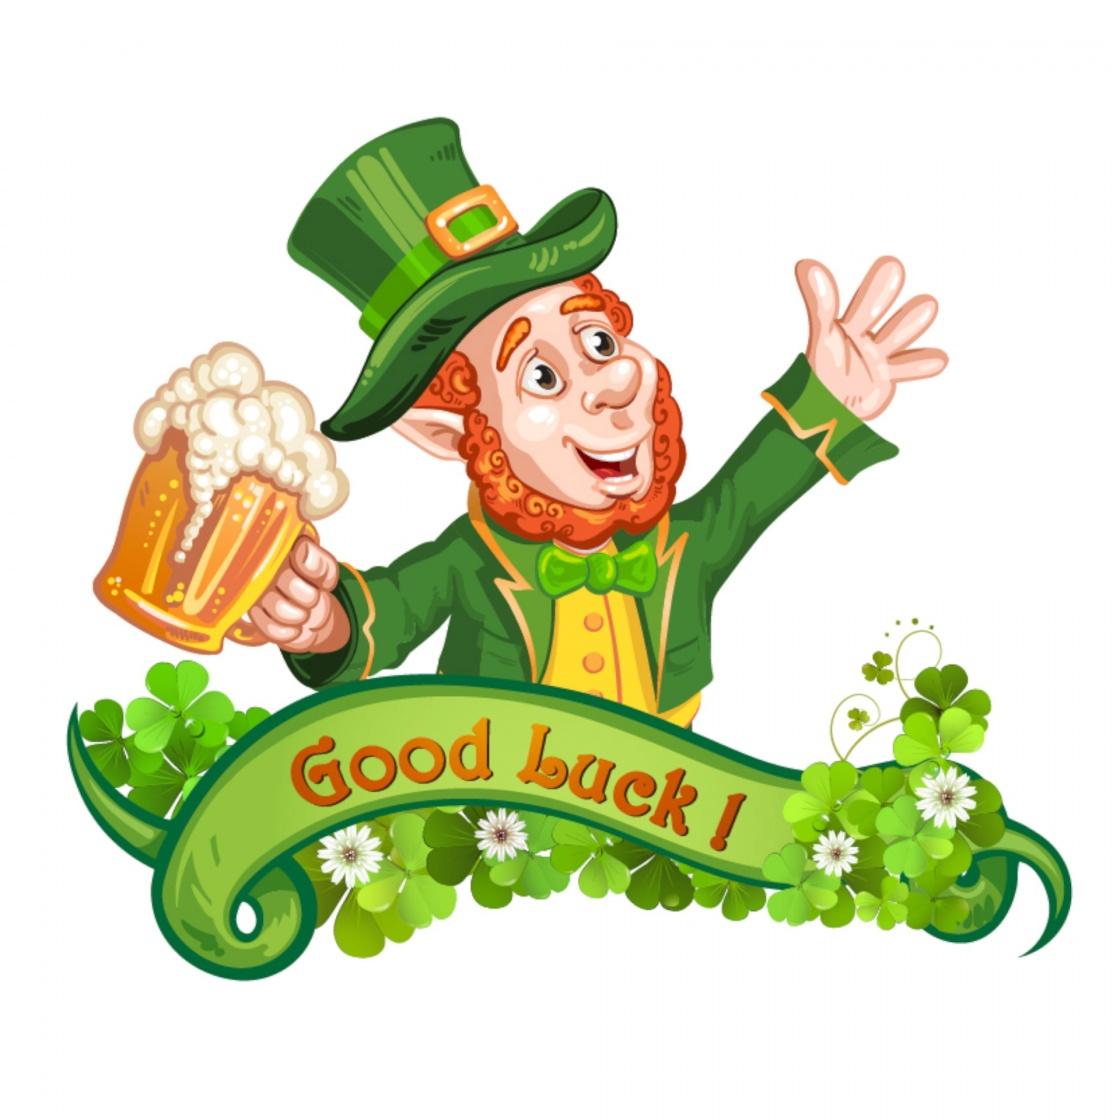 the-legend-of-leprechauns-leprechaun-drinking-beer-st-patrick-39-s-day-cartoon-245-16b9